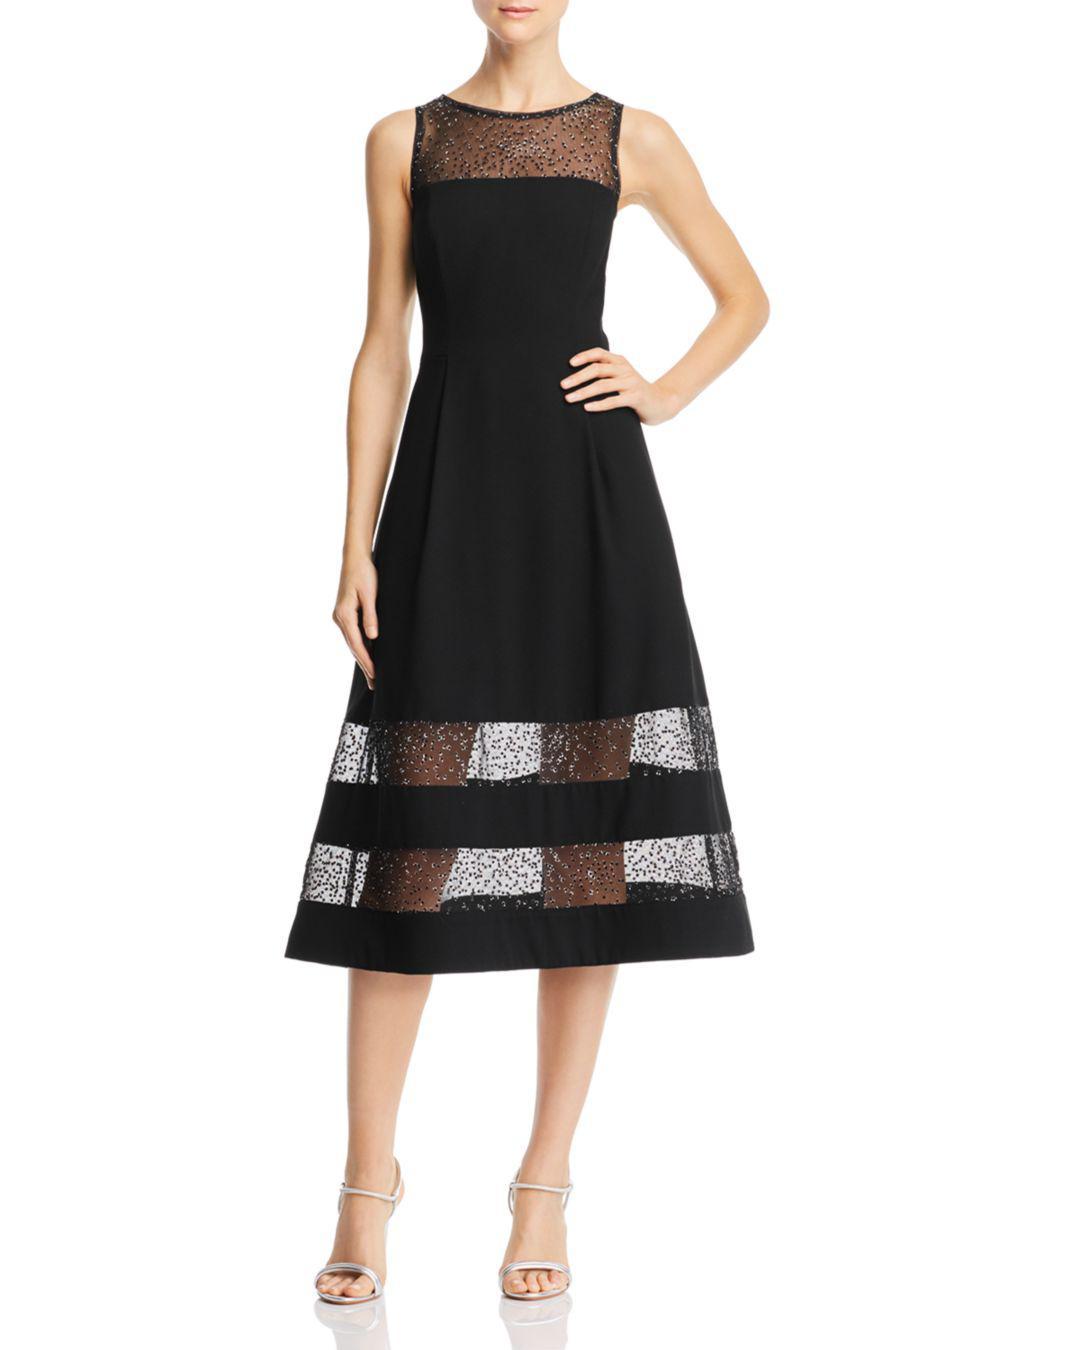 037262f34db Lyst - Aidan By Aidan Mattox Embroidered Crepe Dress in Black - Save ...